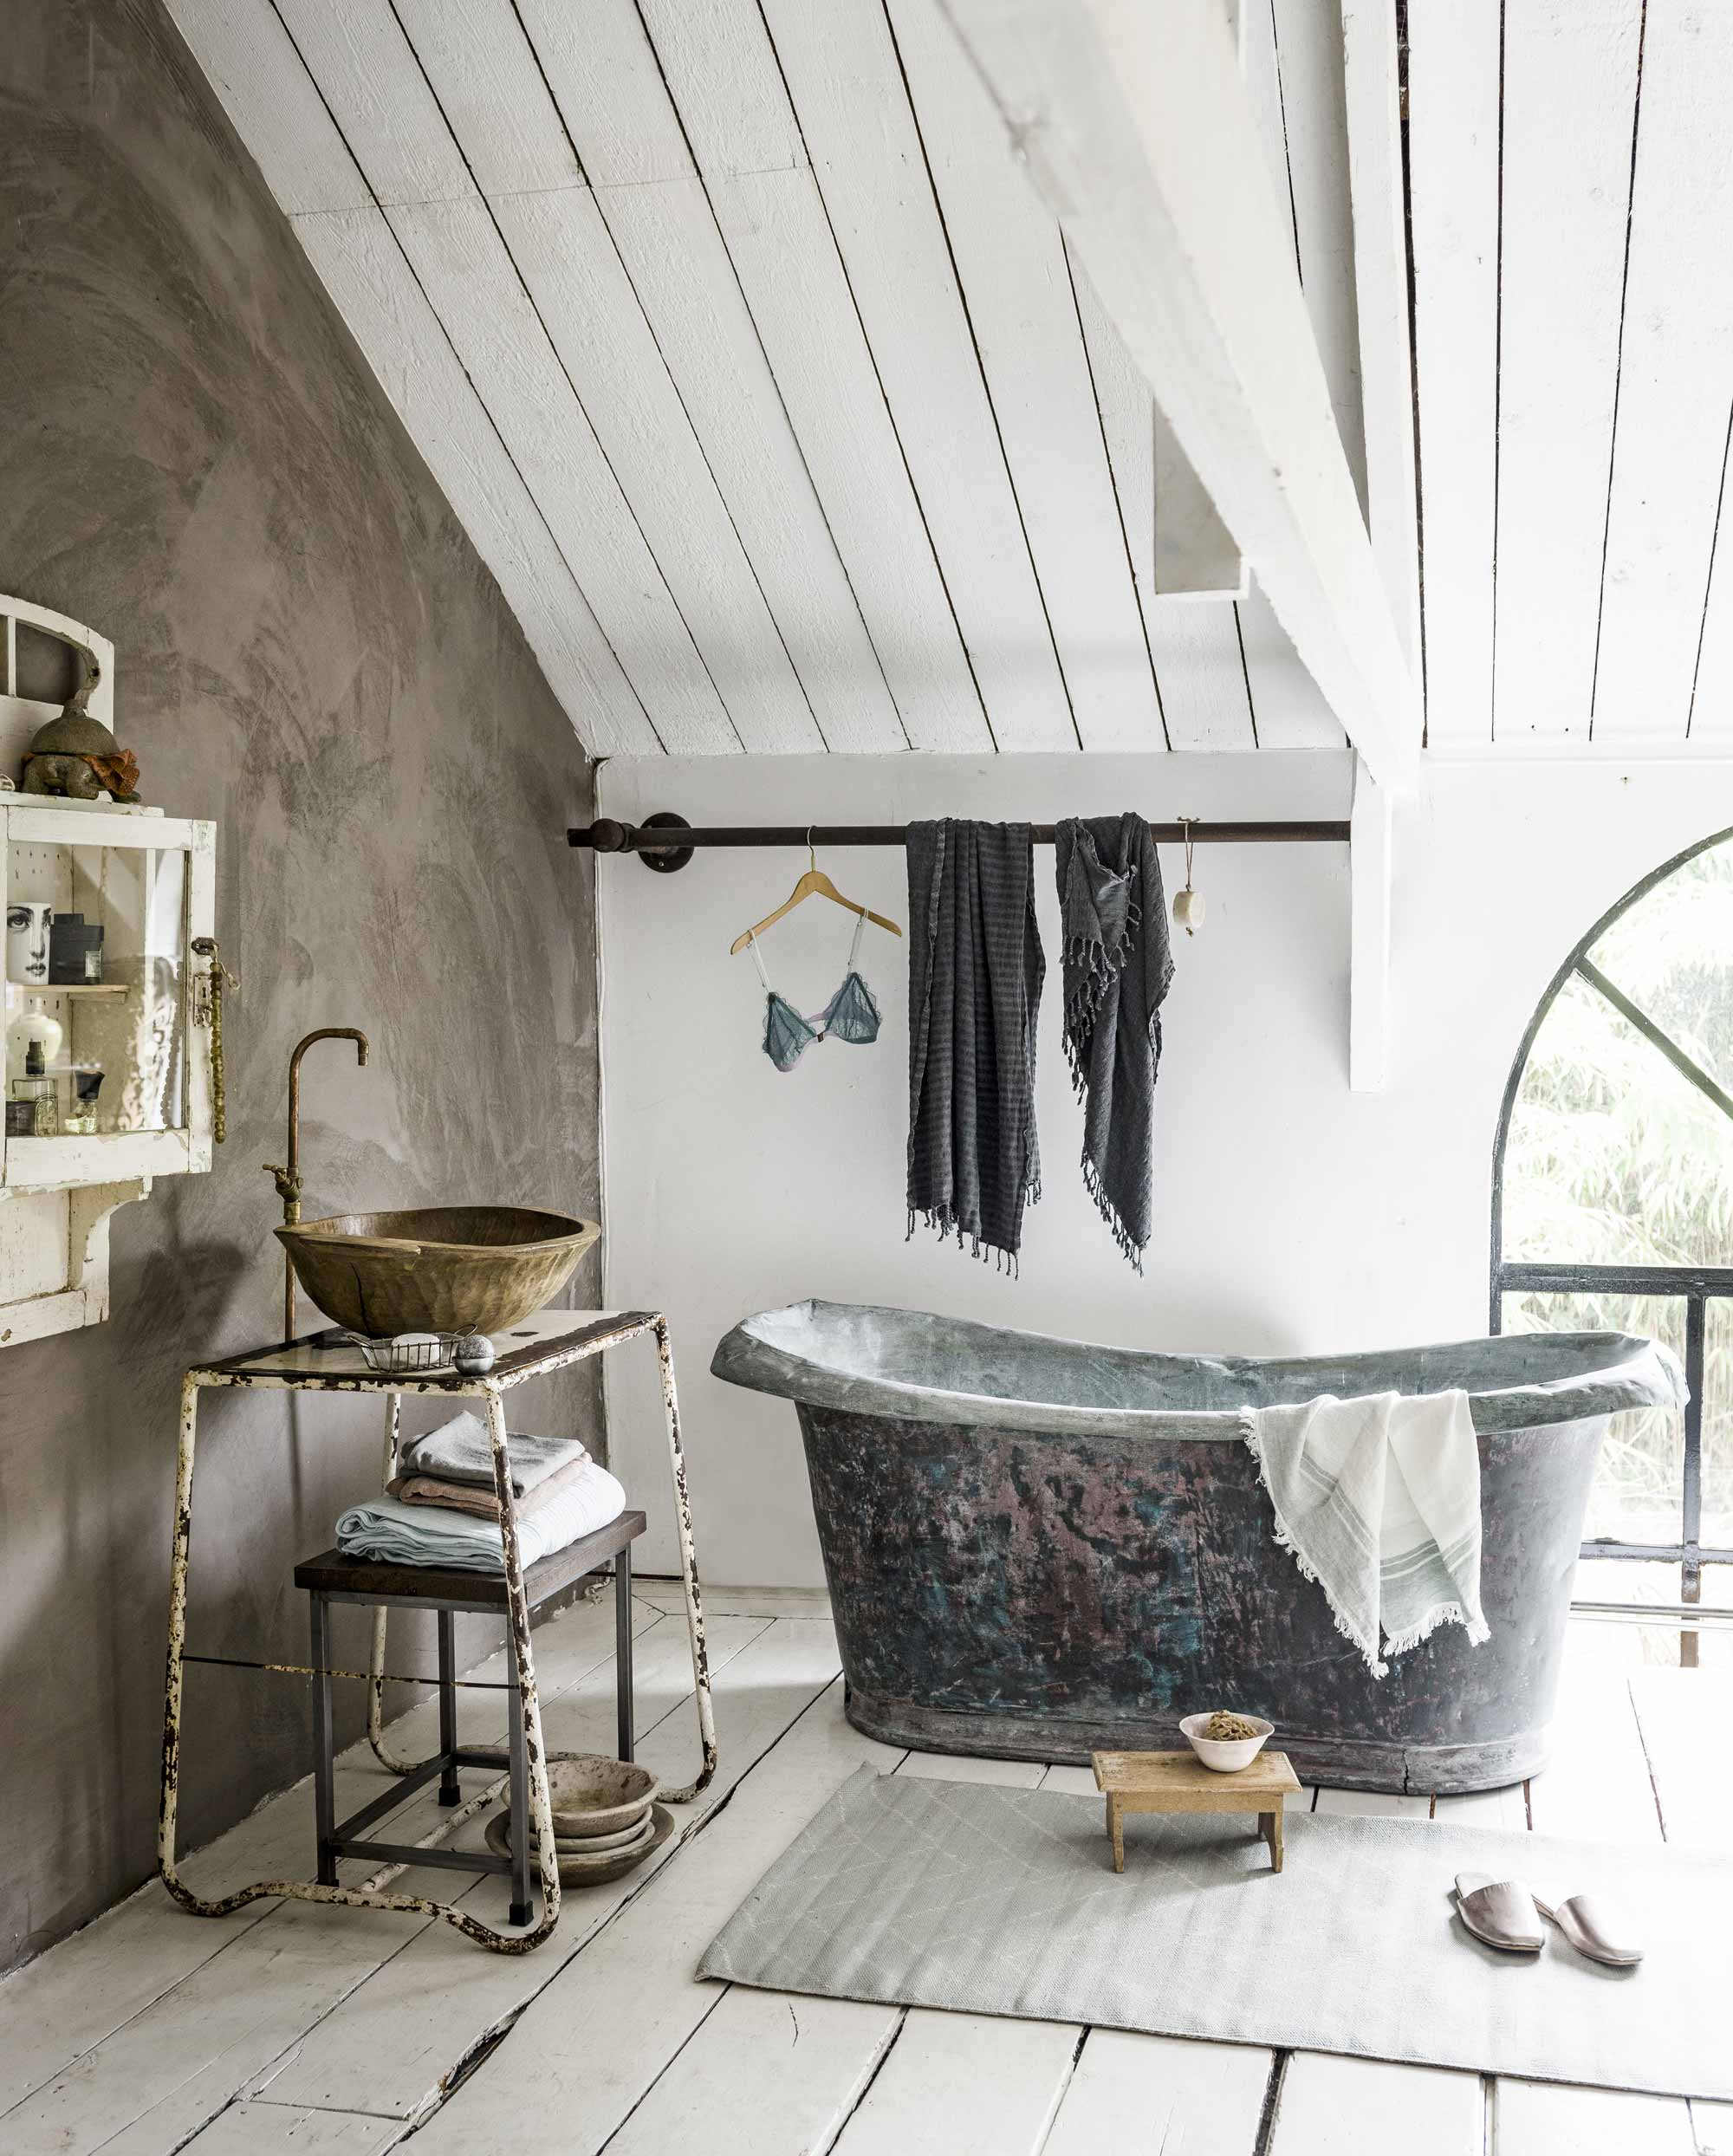 oude badkamer ligbad wastafeltje